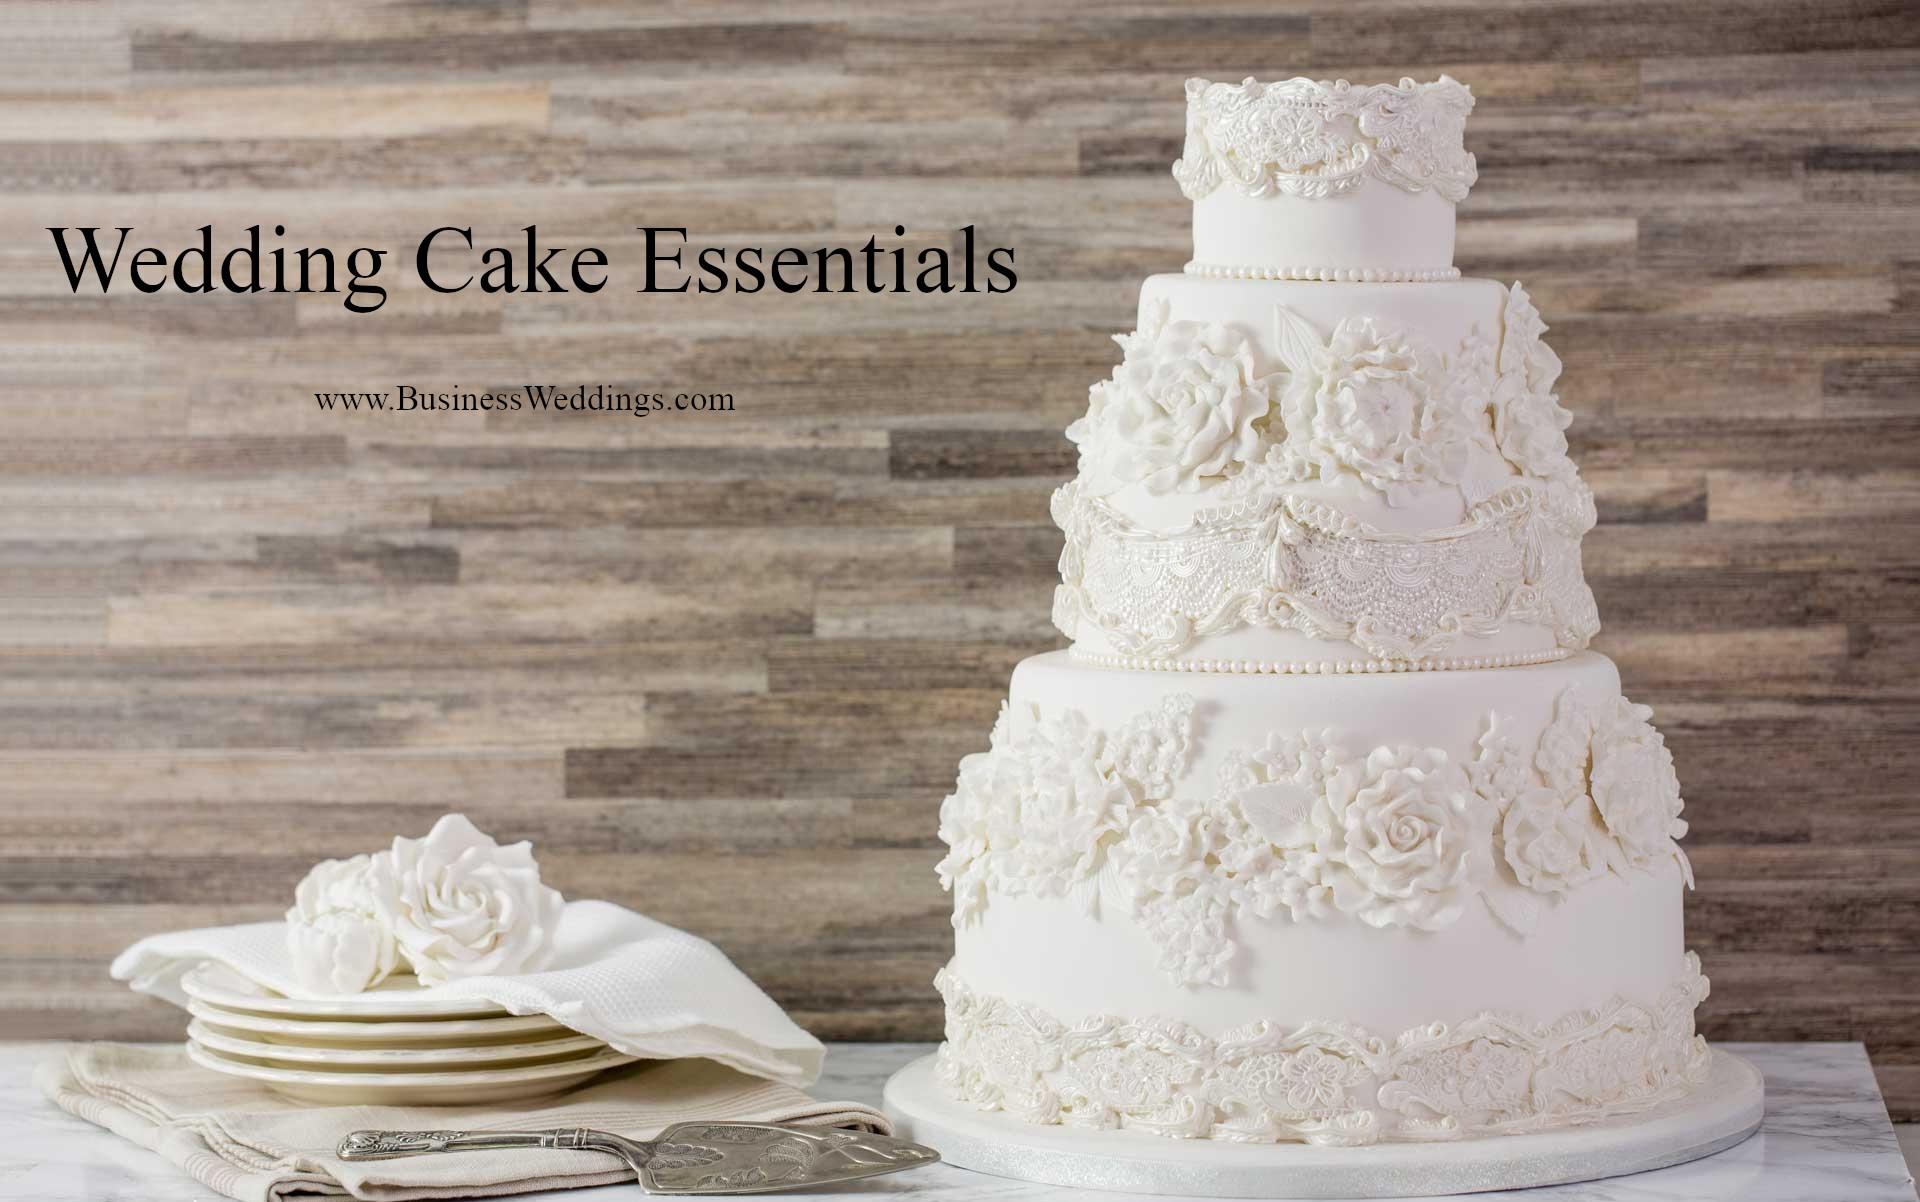 Simple Wedding Cakes Wedding Cake Essentials